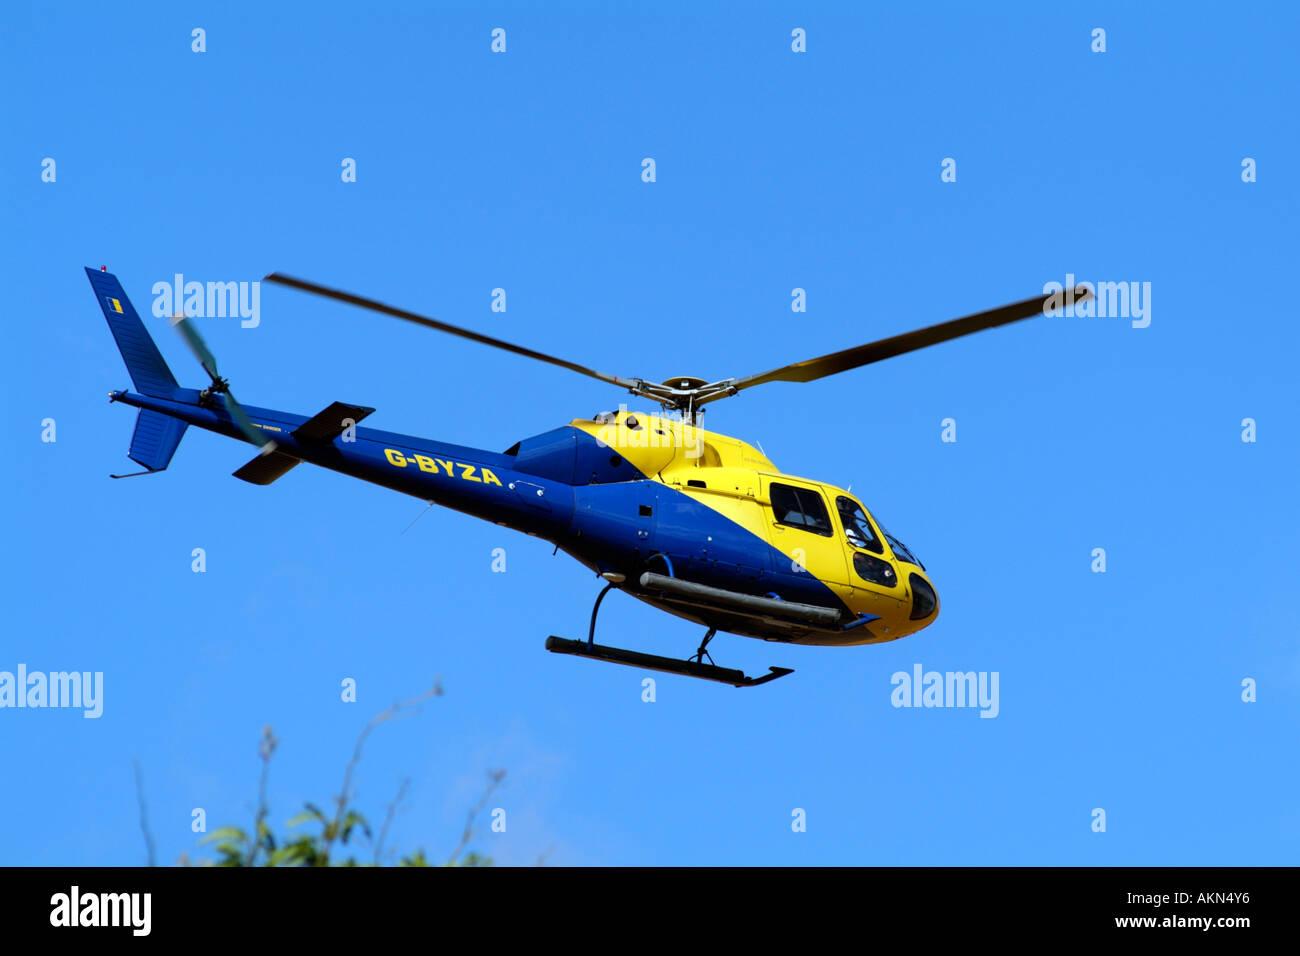 Elicottero 355 : Eurocopter as ecureuil ii elicottero di decollare micheldever